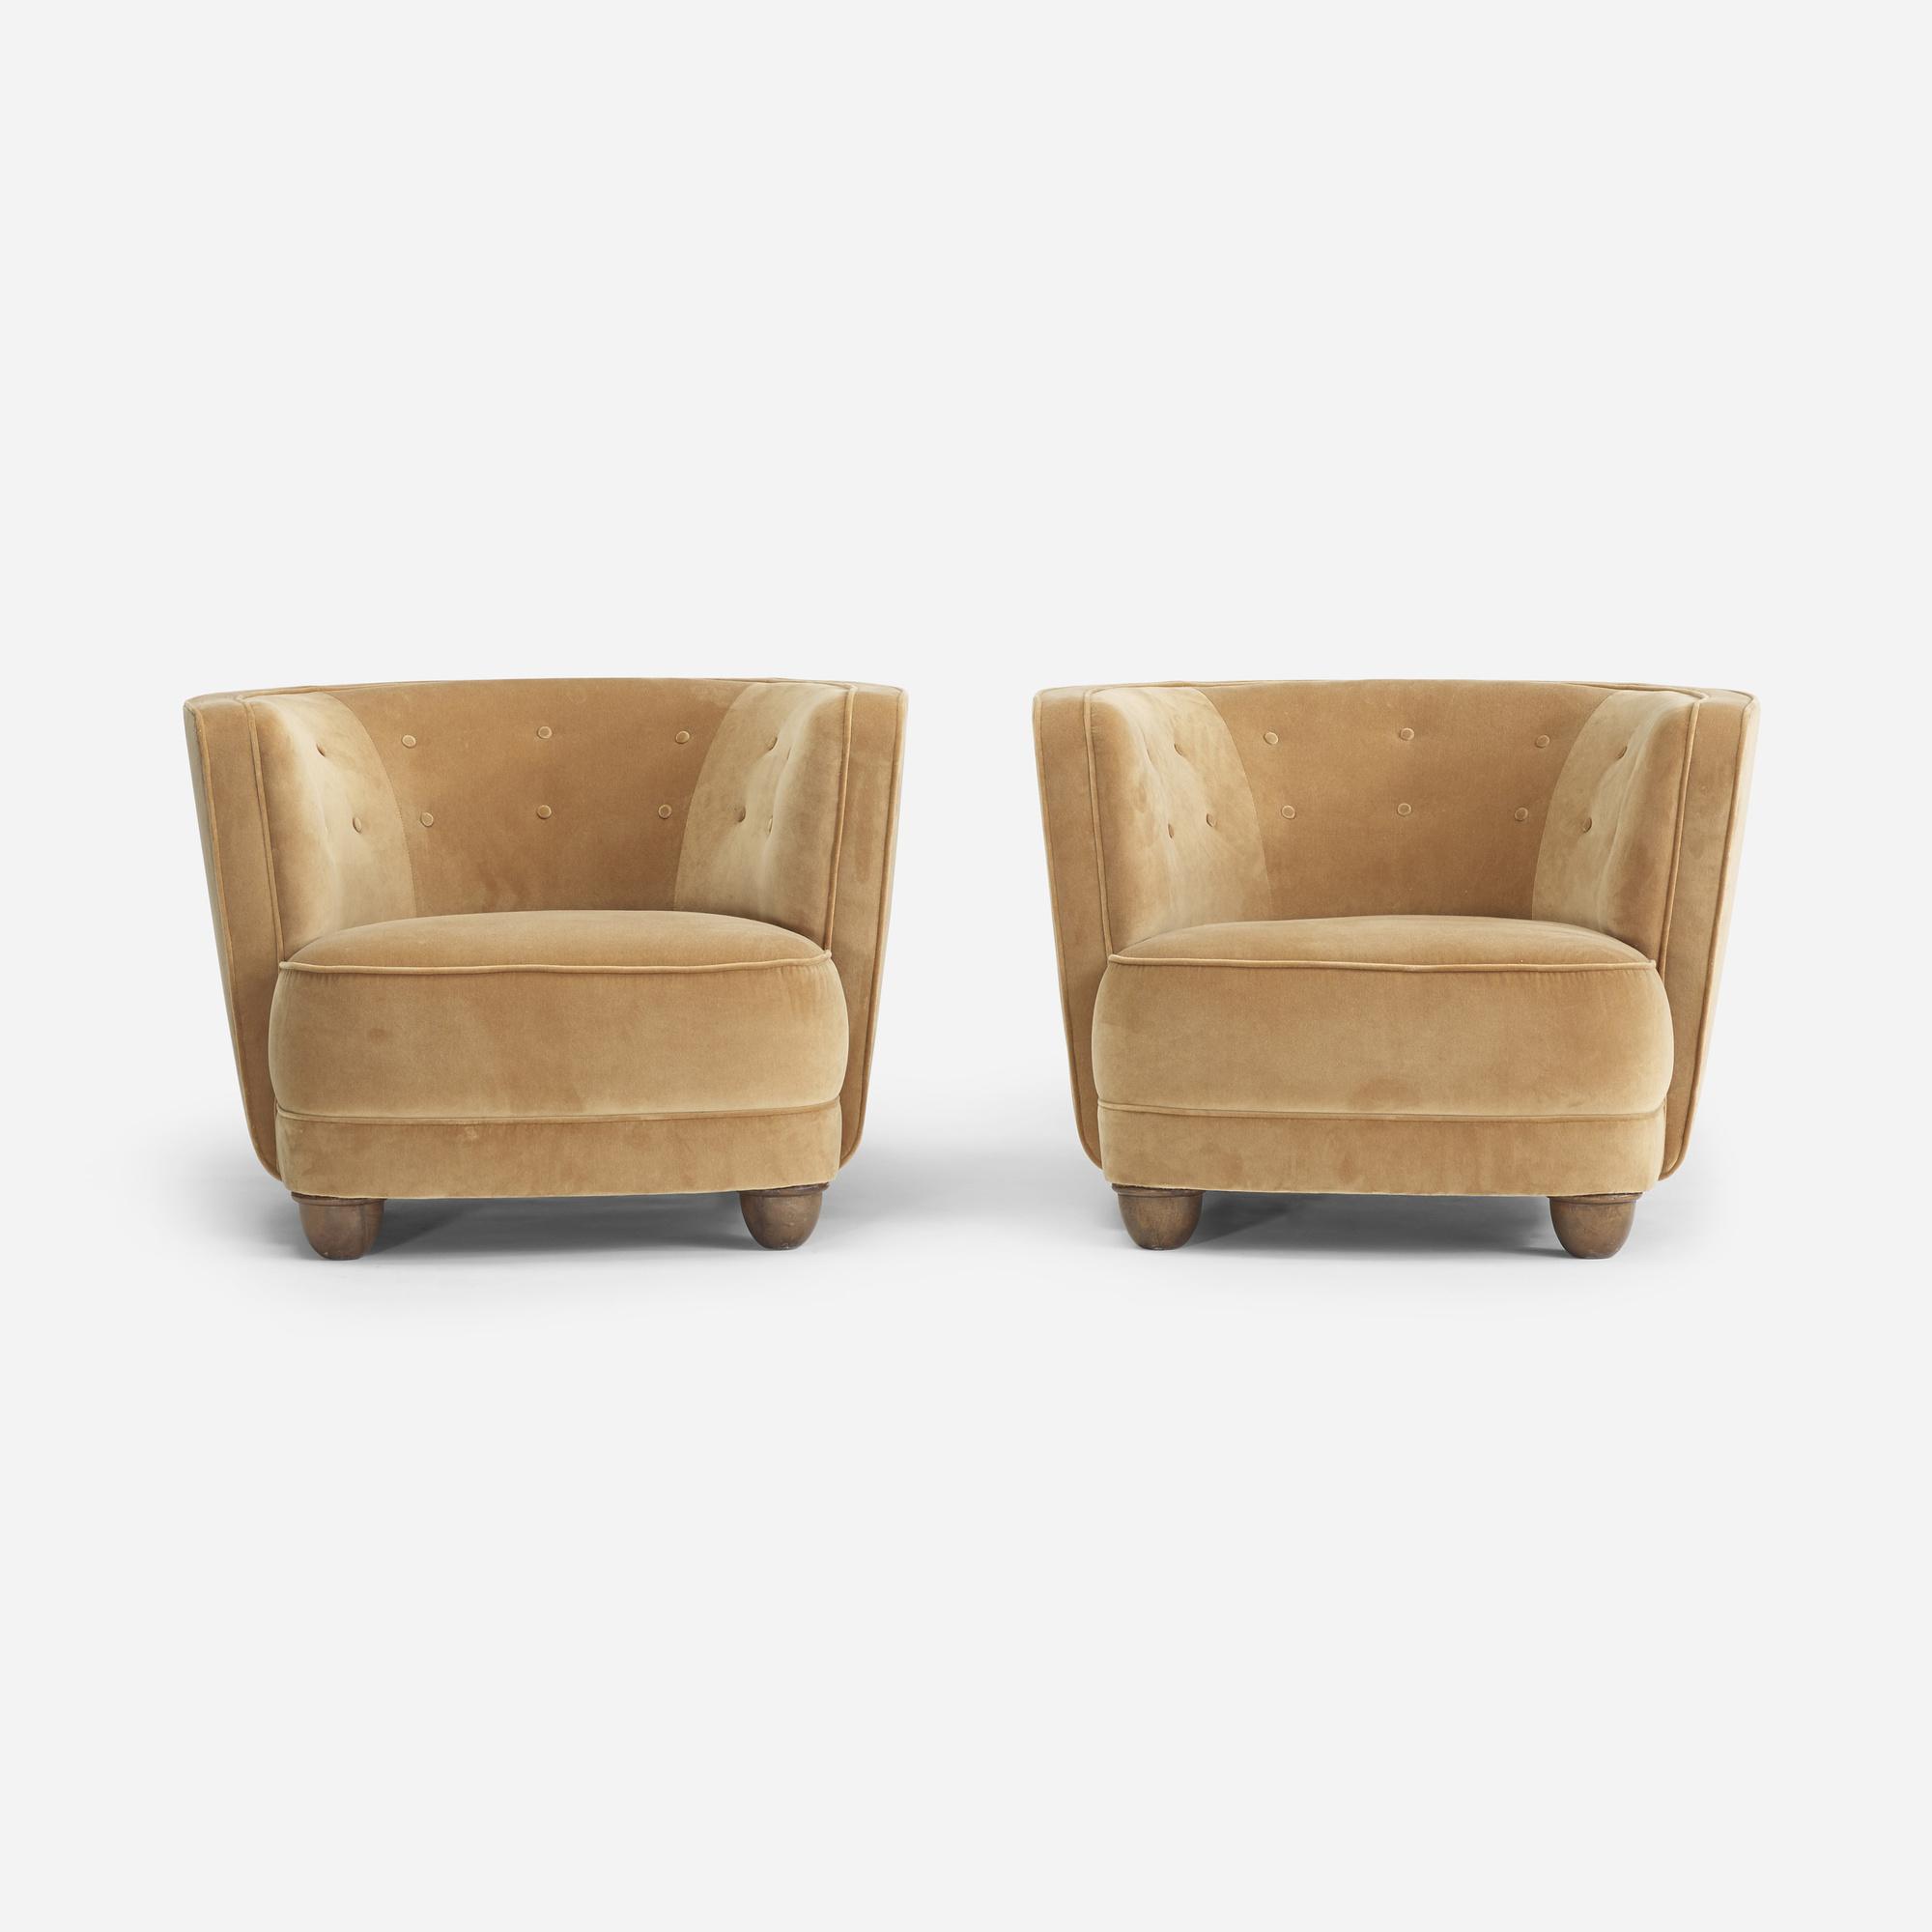 111: Danish Cabinetmaker / lounge chairs, pair (1 of 4)